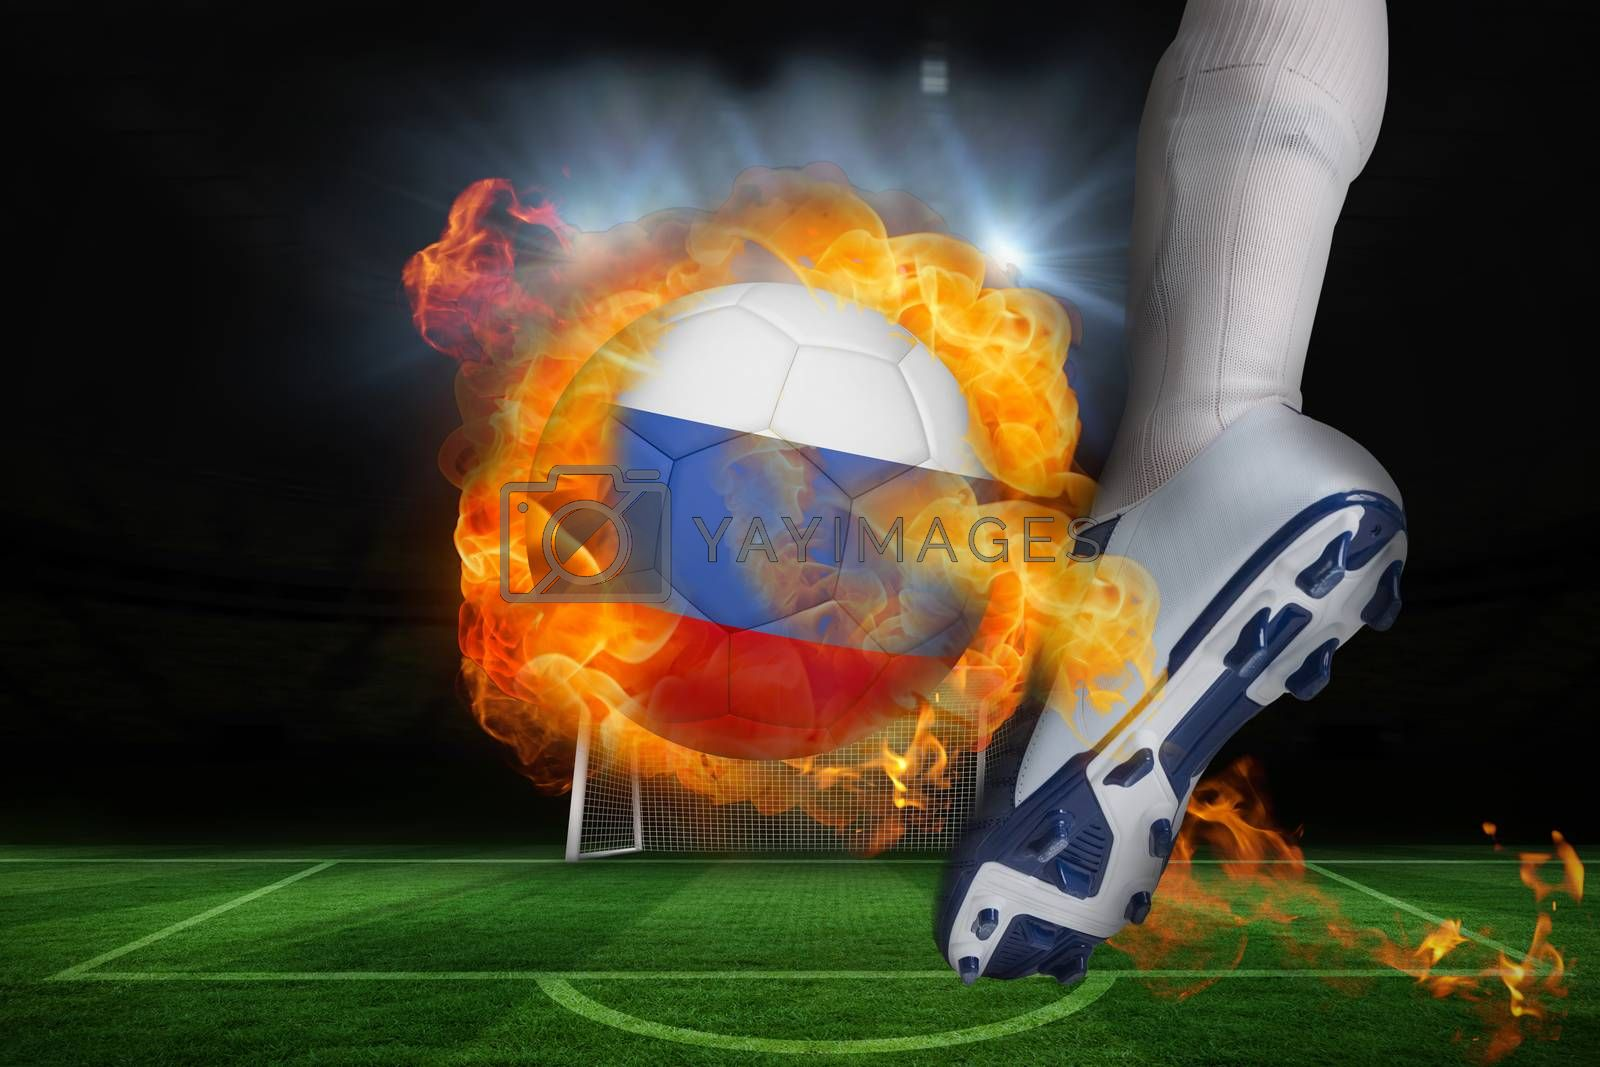 Football player kicking flaming russia flag ball by Wavebreakmedia